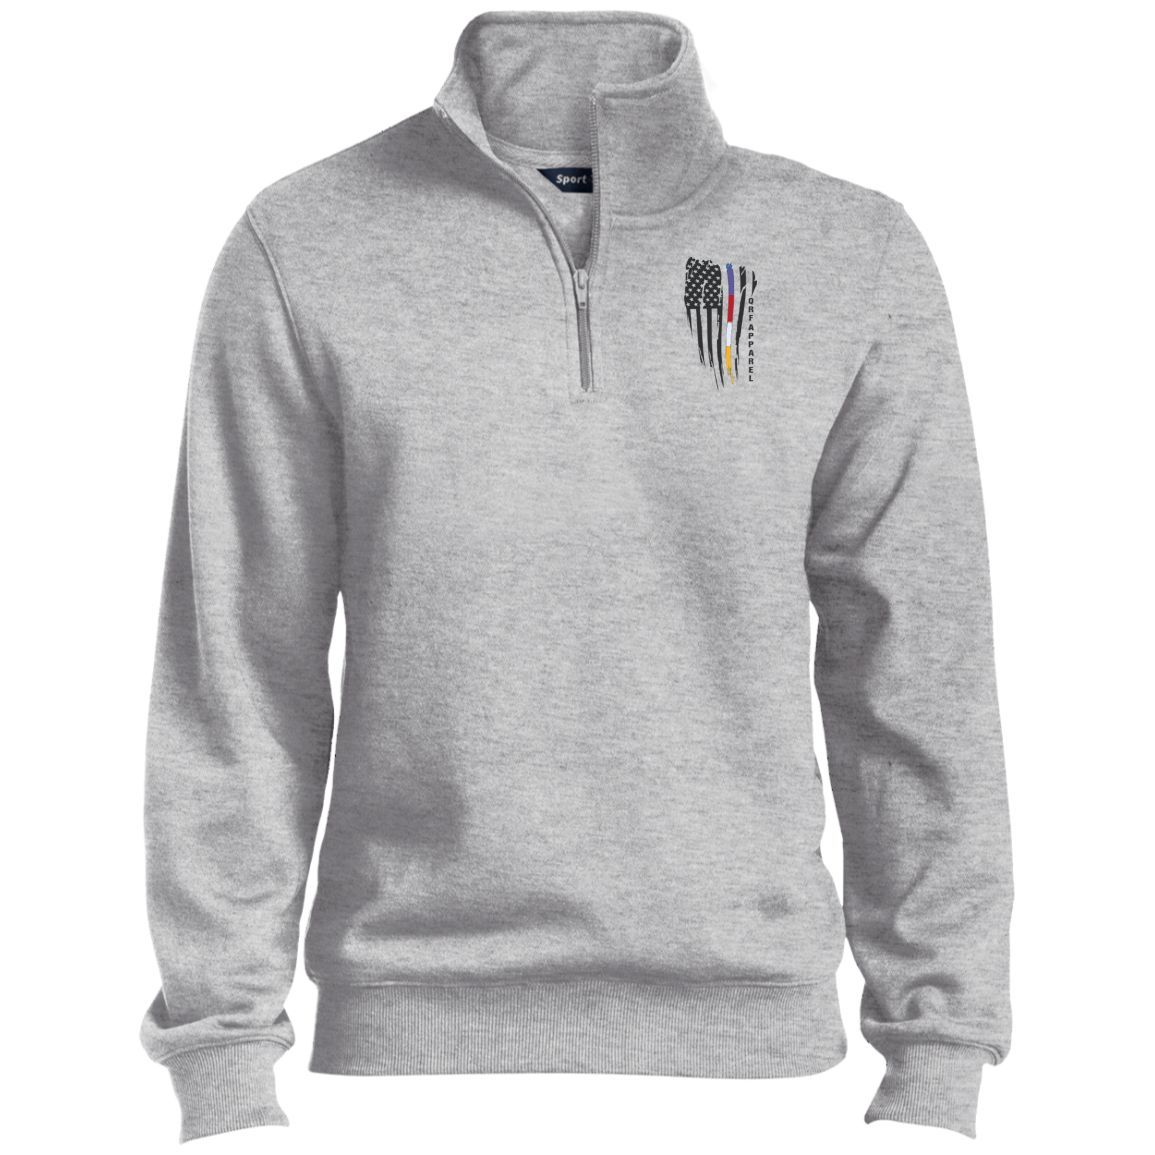 QRF Brand Tall Quarter-Zip Embroidered Sweatshirt